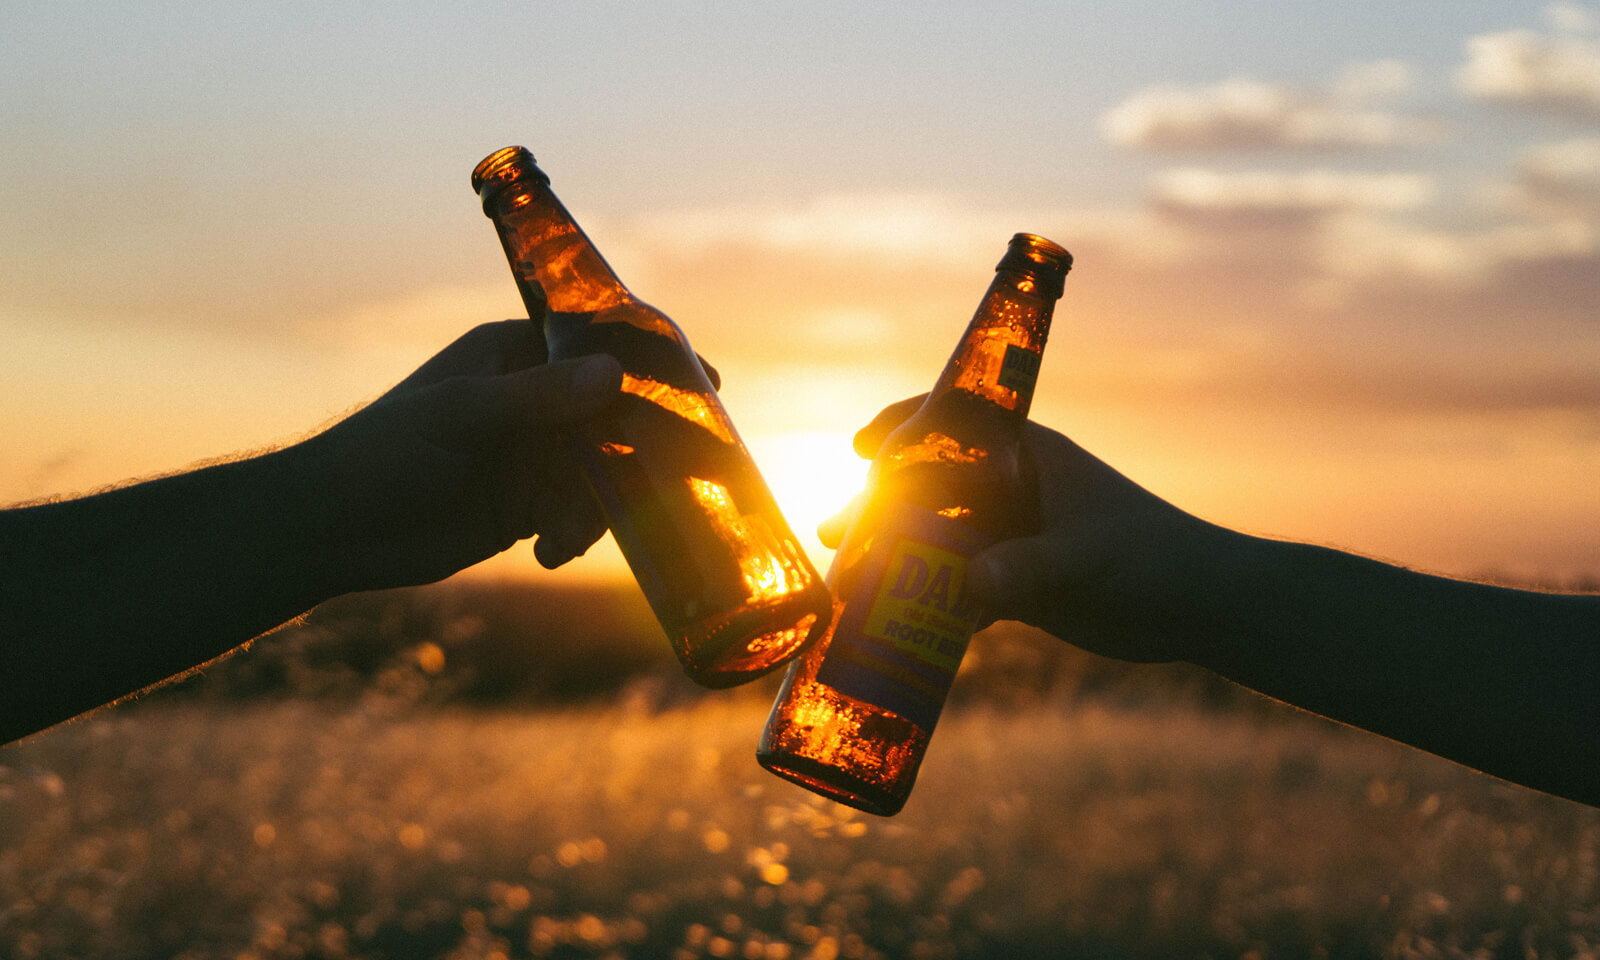 beer bottles clinking together in front of sunset